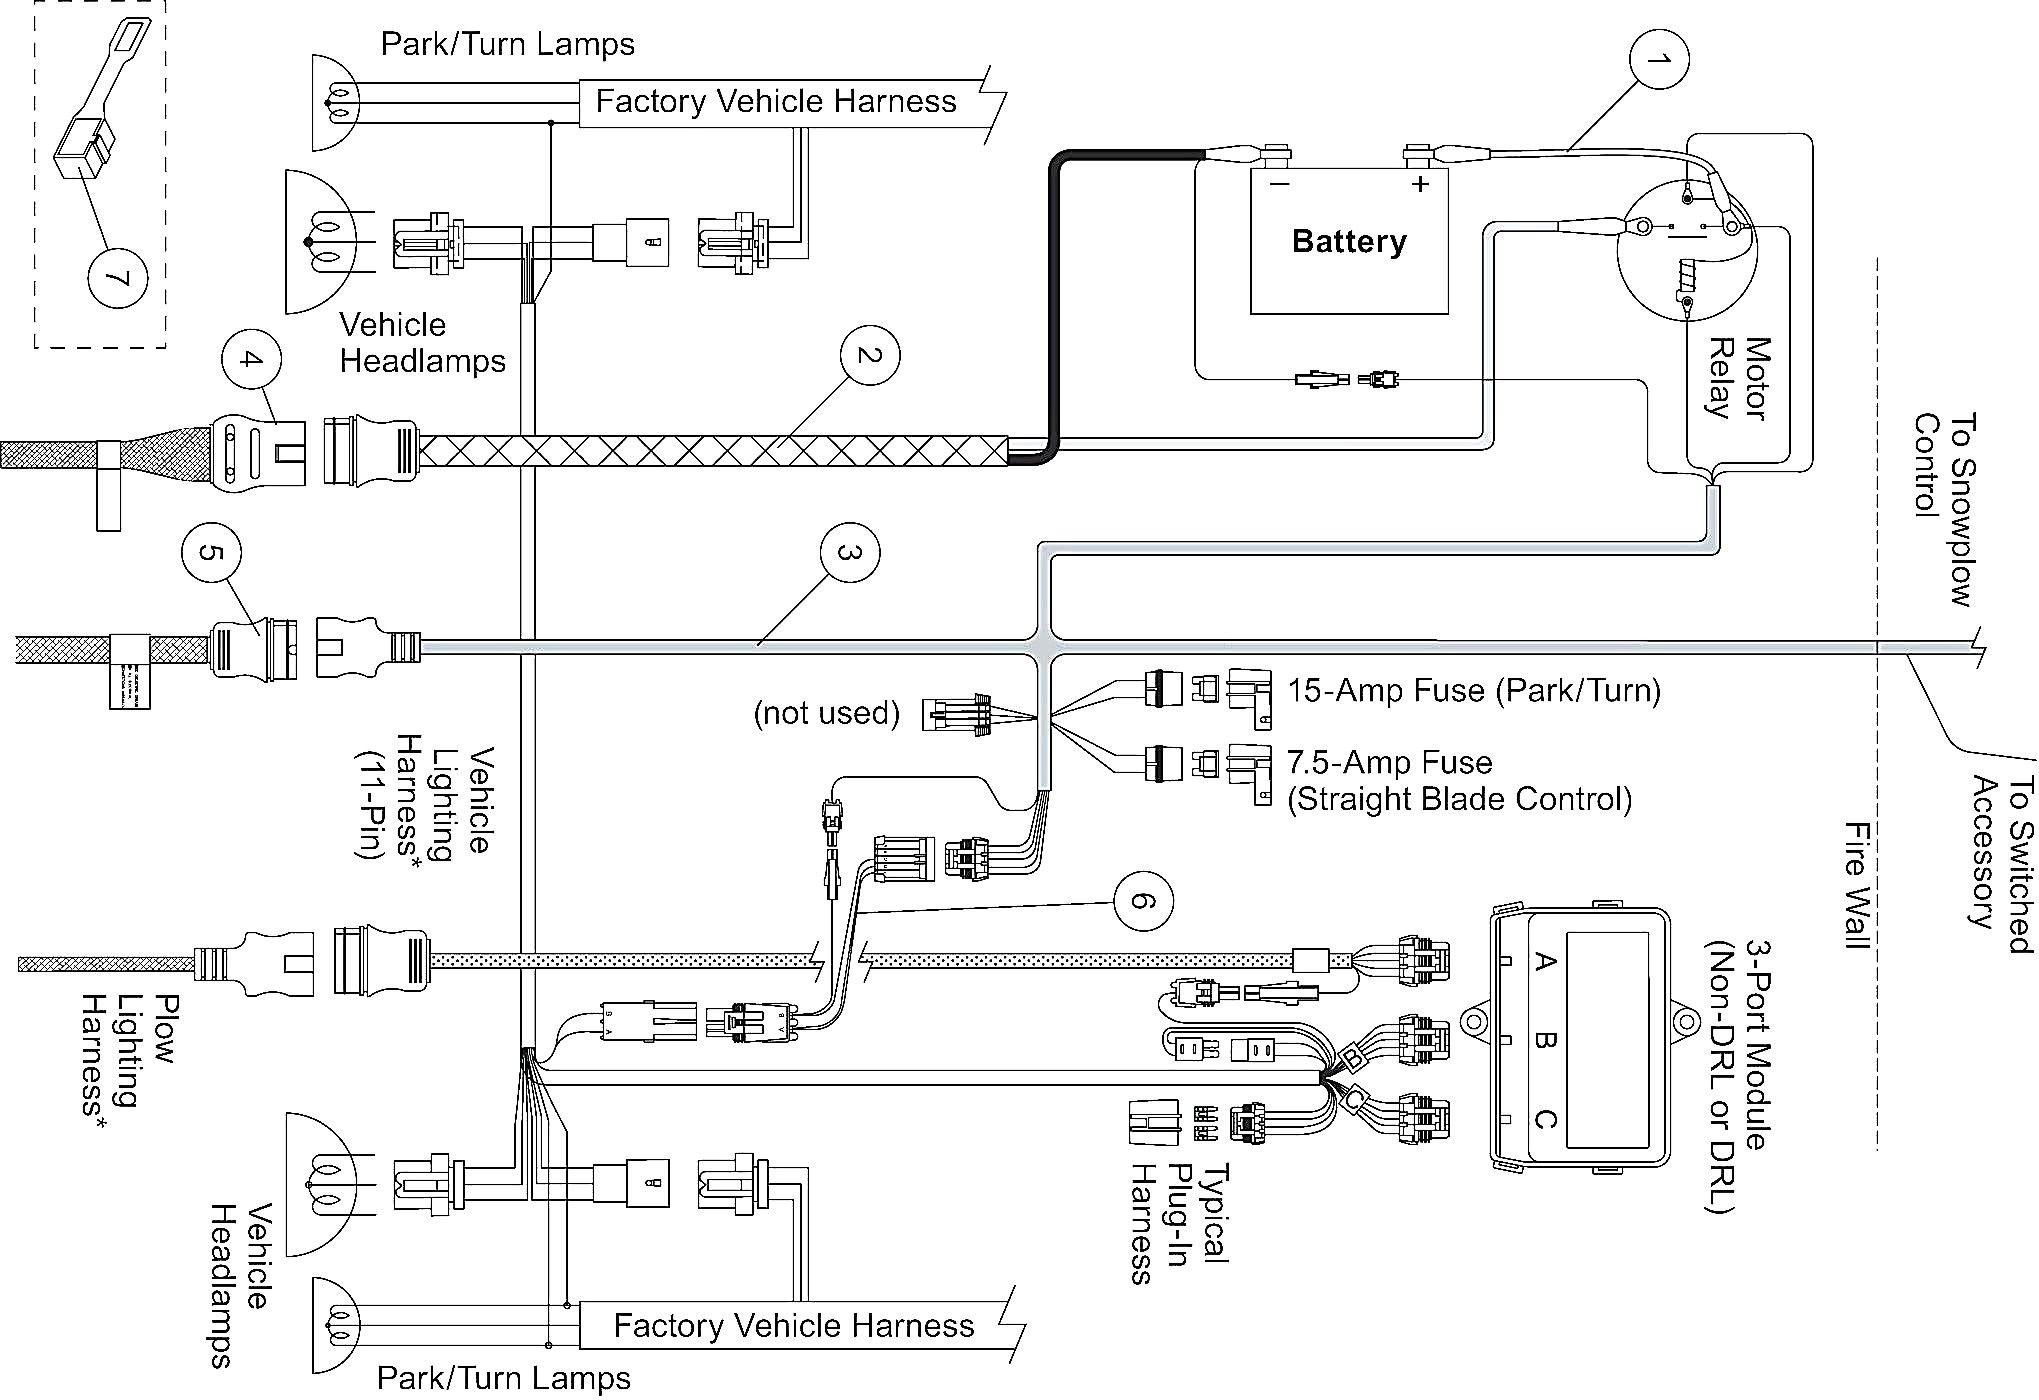 Boss Rt3 Wiring Diagram New in 2020 Snow plow, Diagram